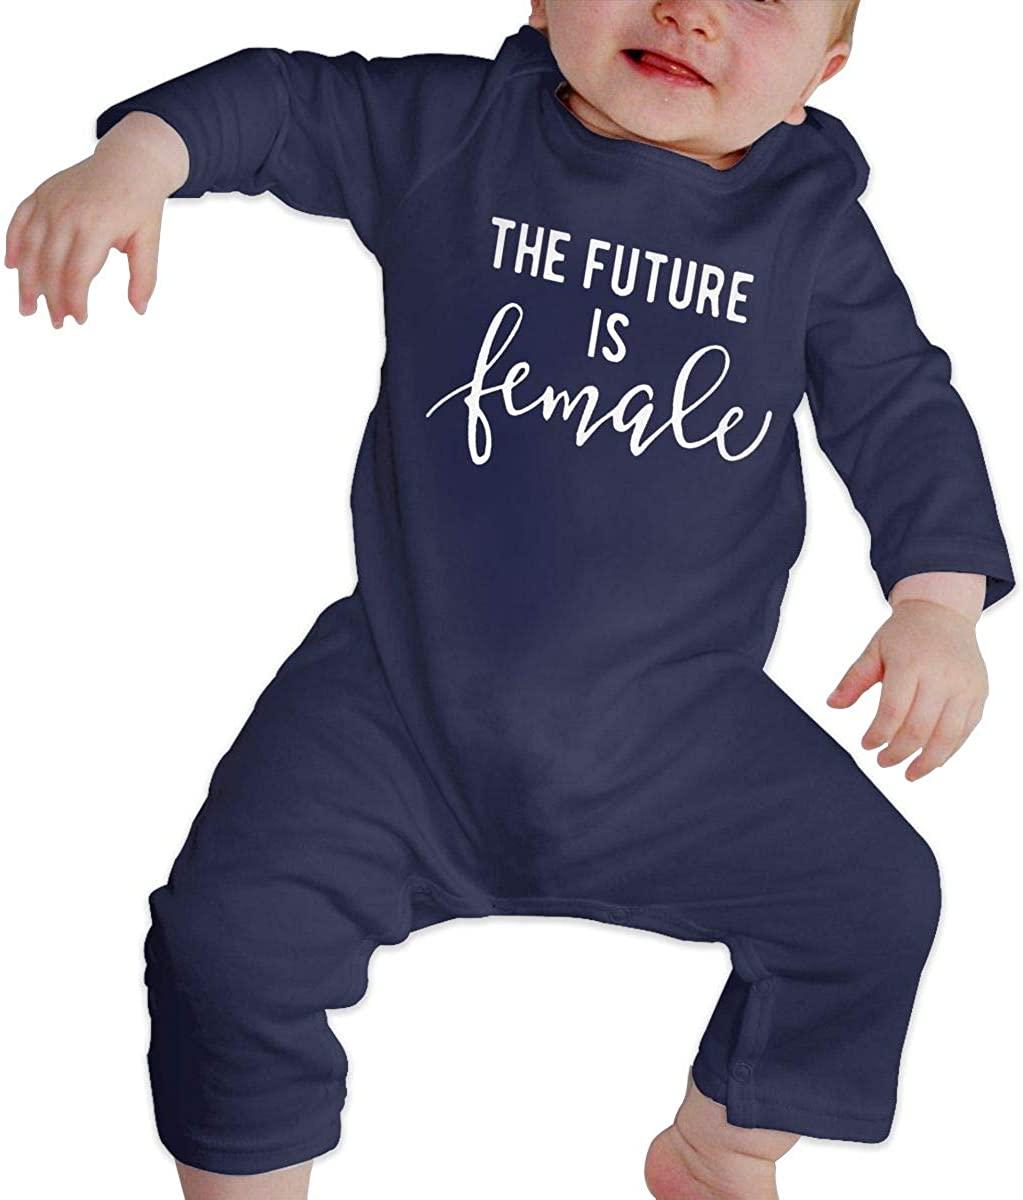 Olyha The Future is Female Baby Long Sleeve Onesies Bodysuit Feminist Cotton Infant Romper Coveralls for Boys Girls